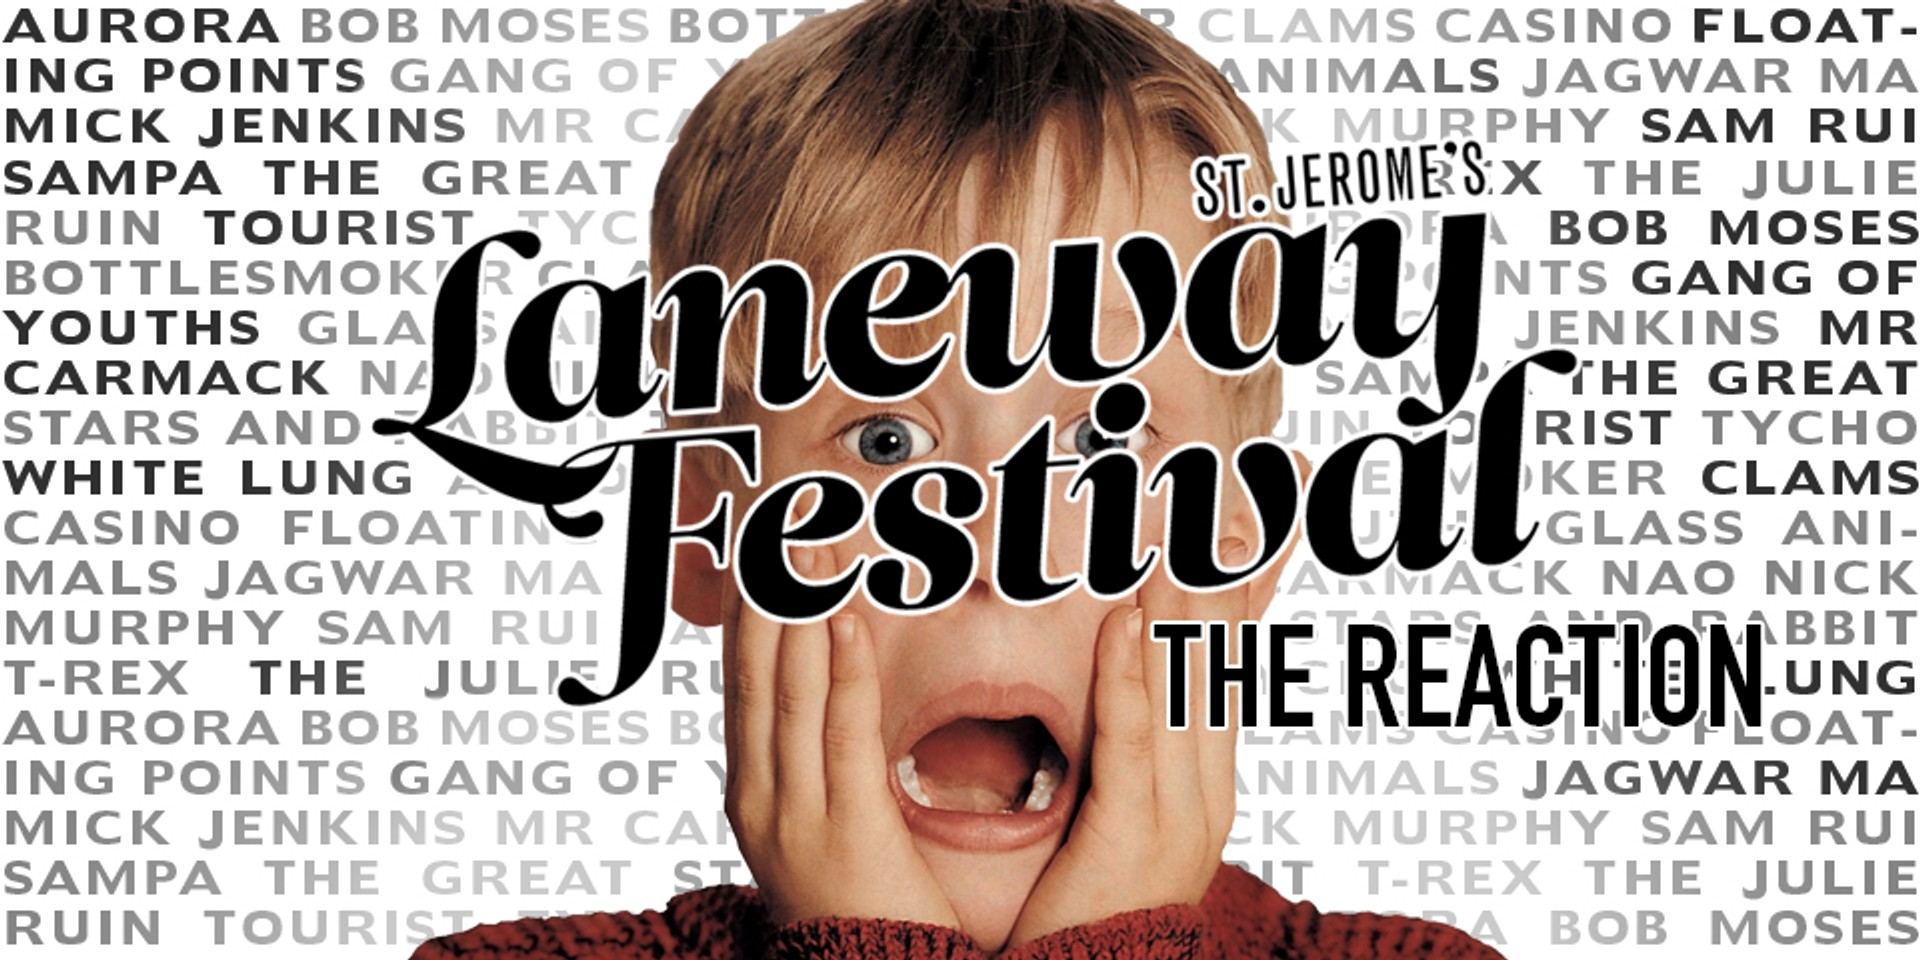 Laneway Festival Singapore 2017 Special: The Reaction